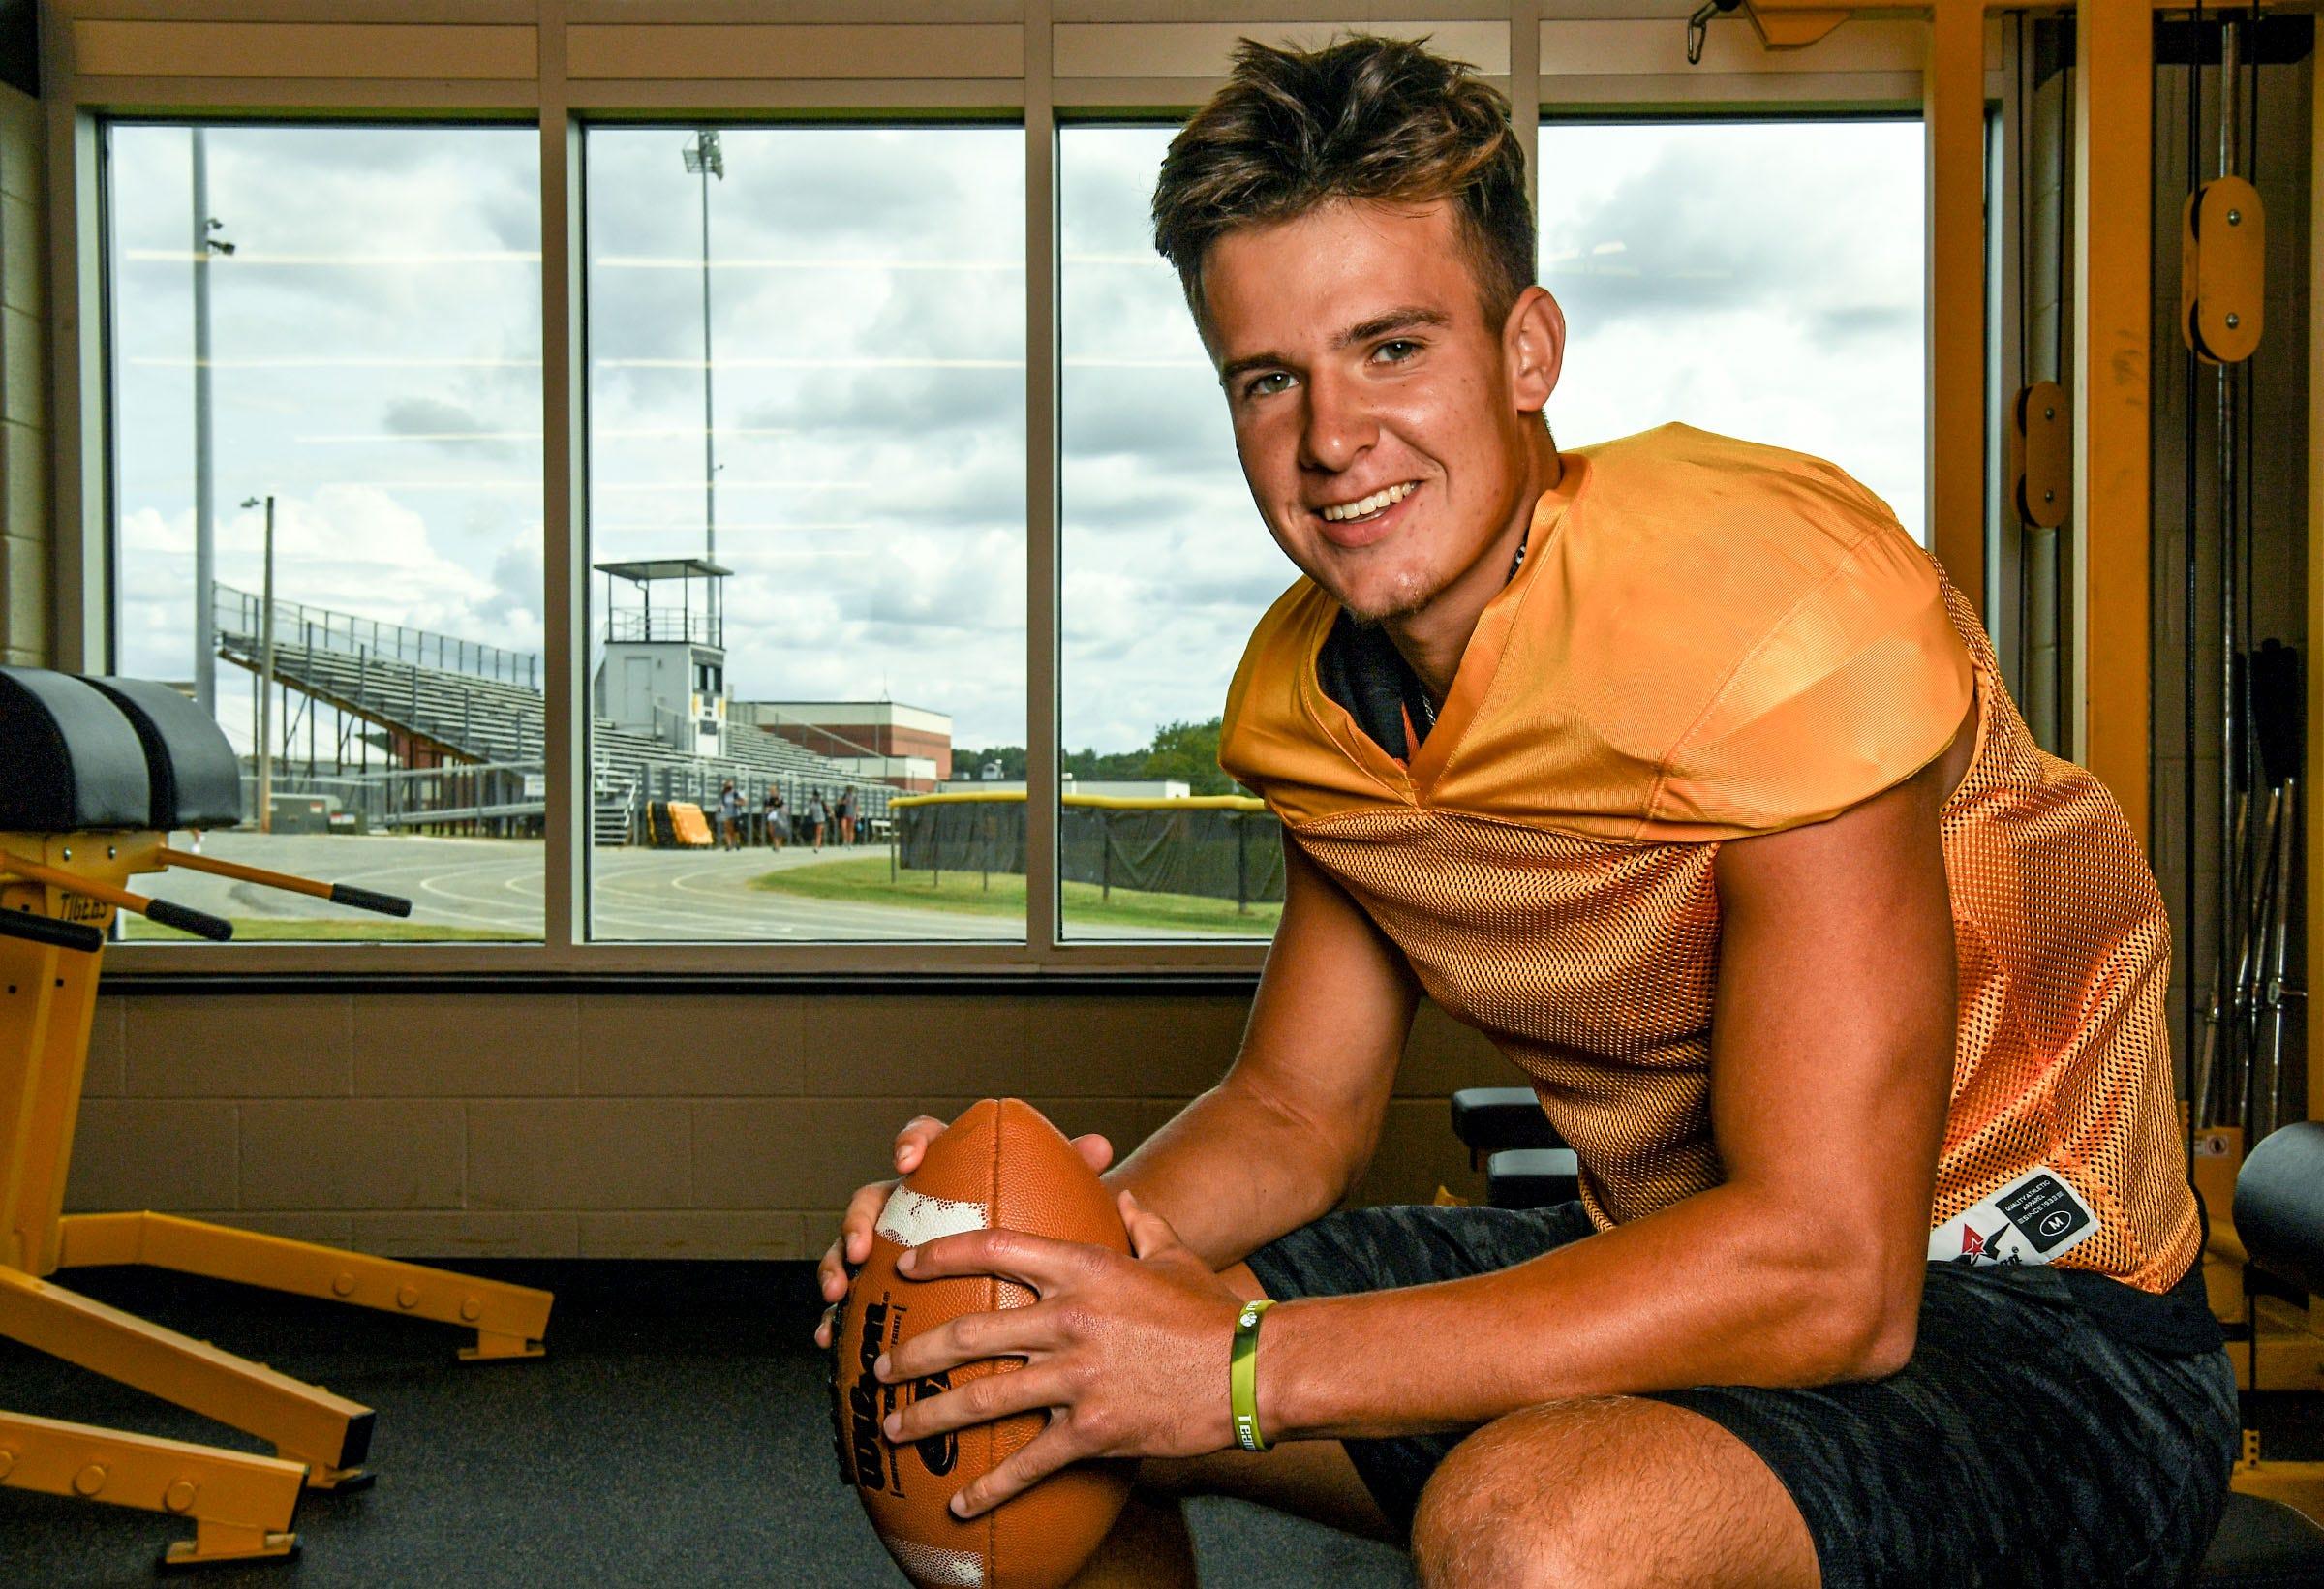 Crescent football player Landon Sauers in Iva, S.C. Wednesday, September 9, 2020.